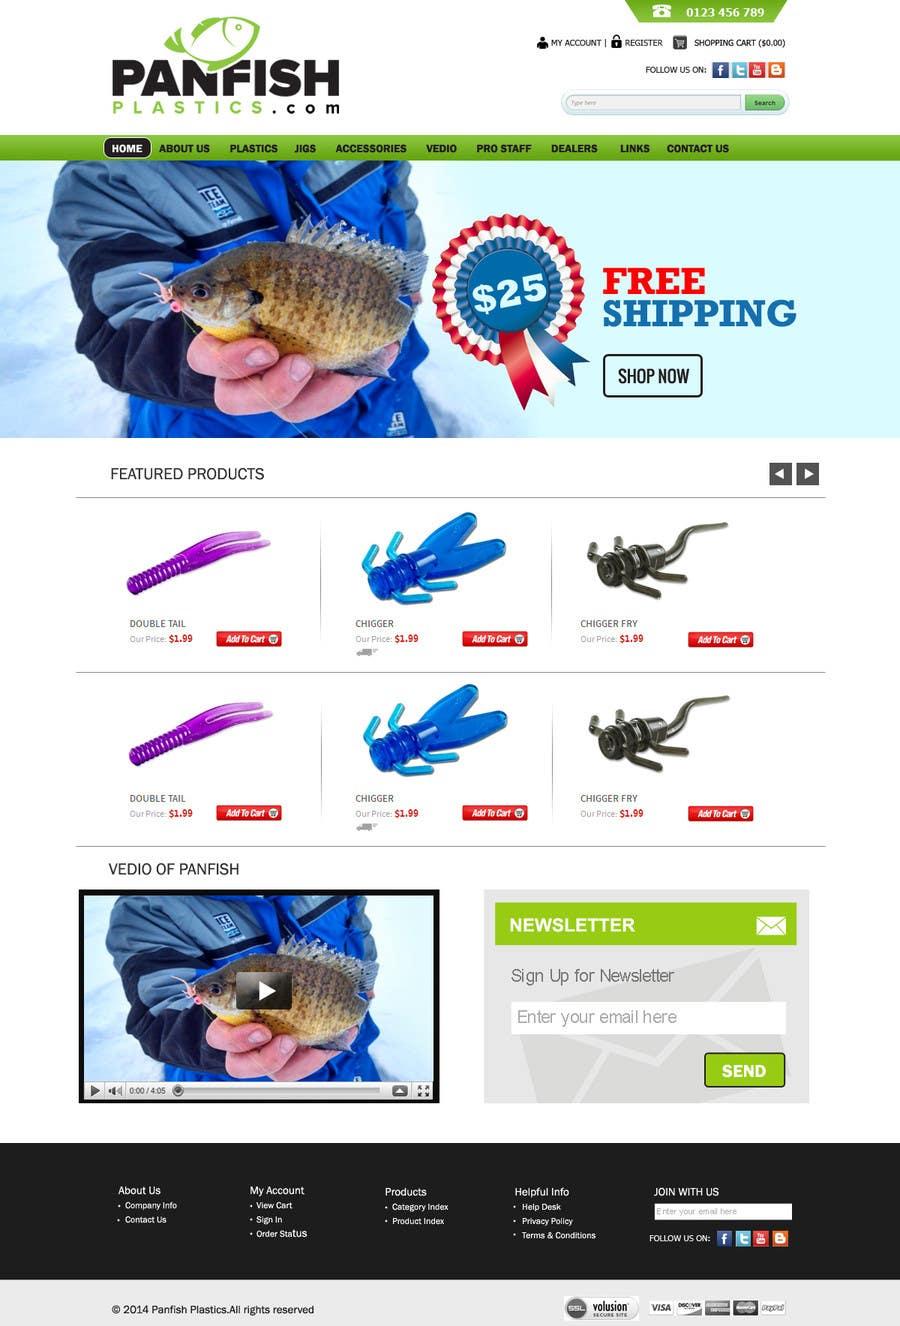 Penyertaan Peraduan #                                        29                                      untuk                                         Design a Website Mockup for ecommerce fishing store